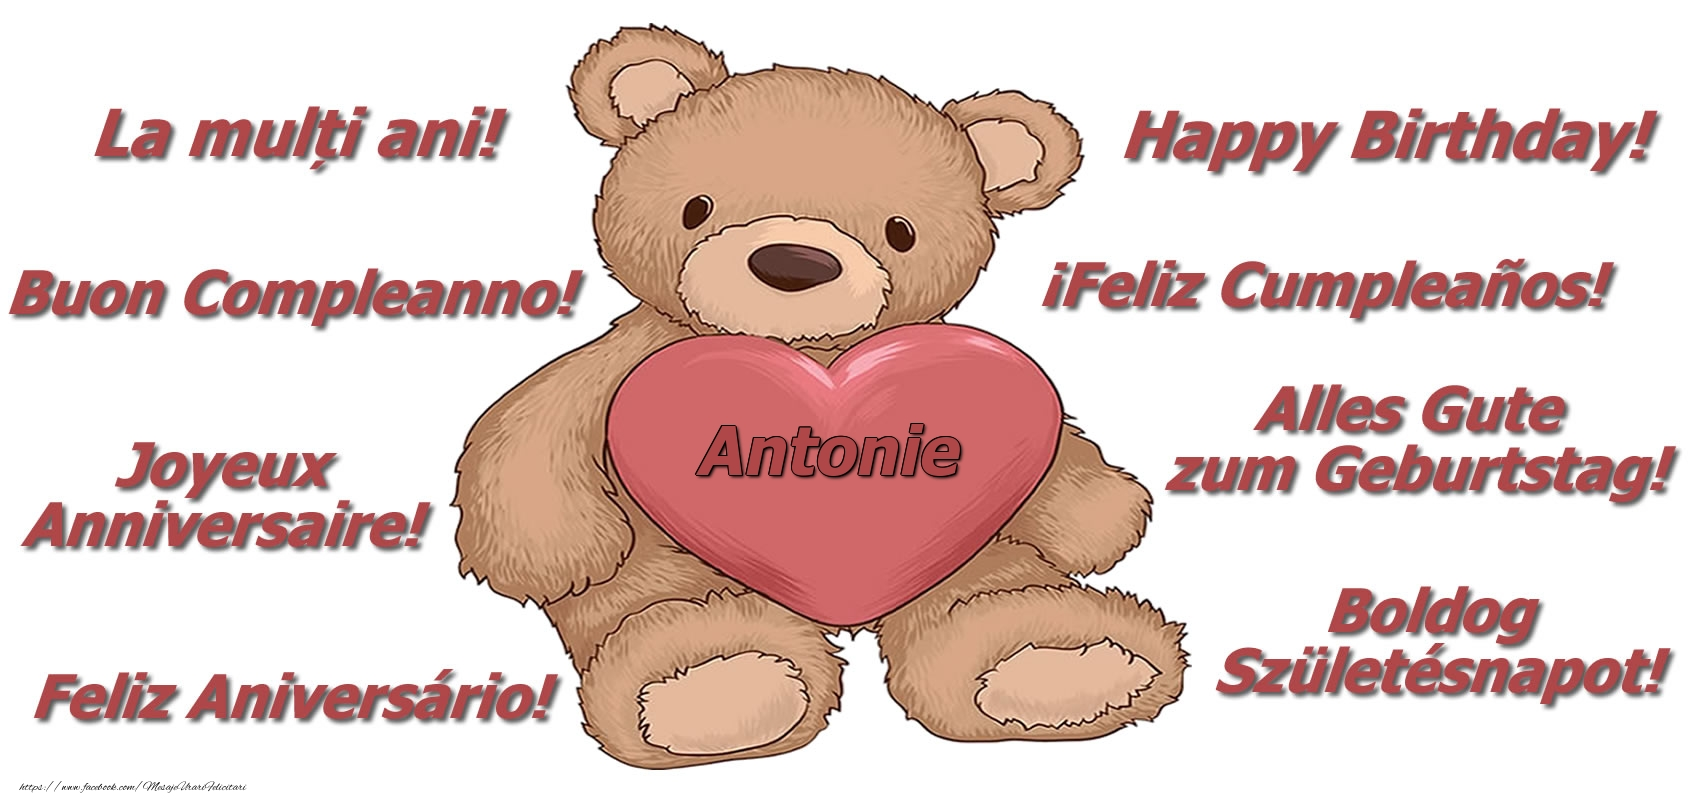 Felicitari de zi de nastere - La multi ani Antonie! - Ursulet